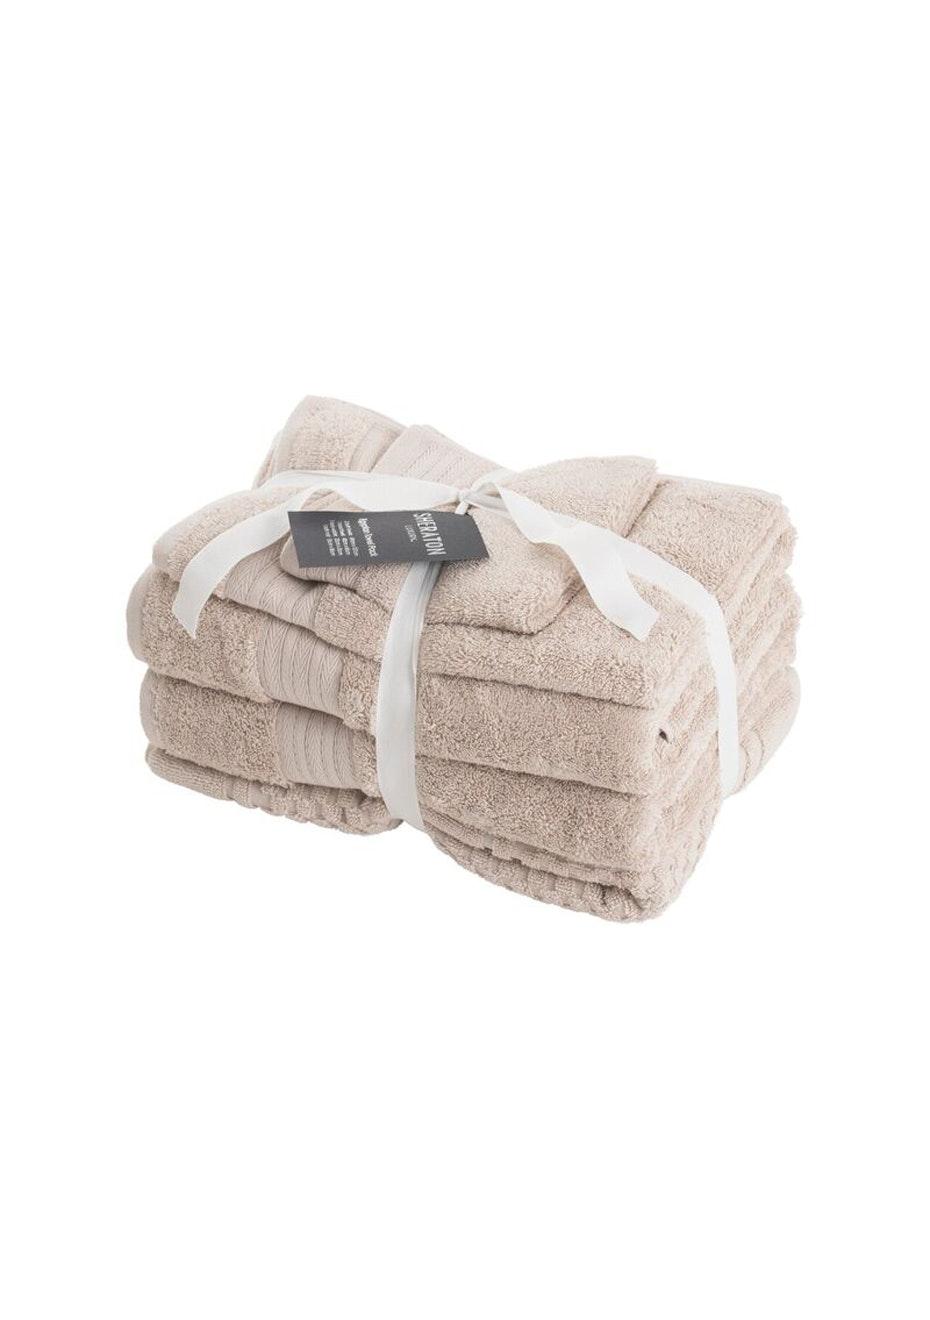 Sheraton Egptian 5 Piece Towel Pack - Colour Stone